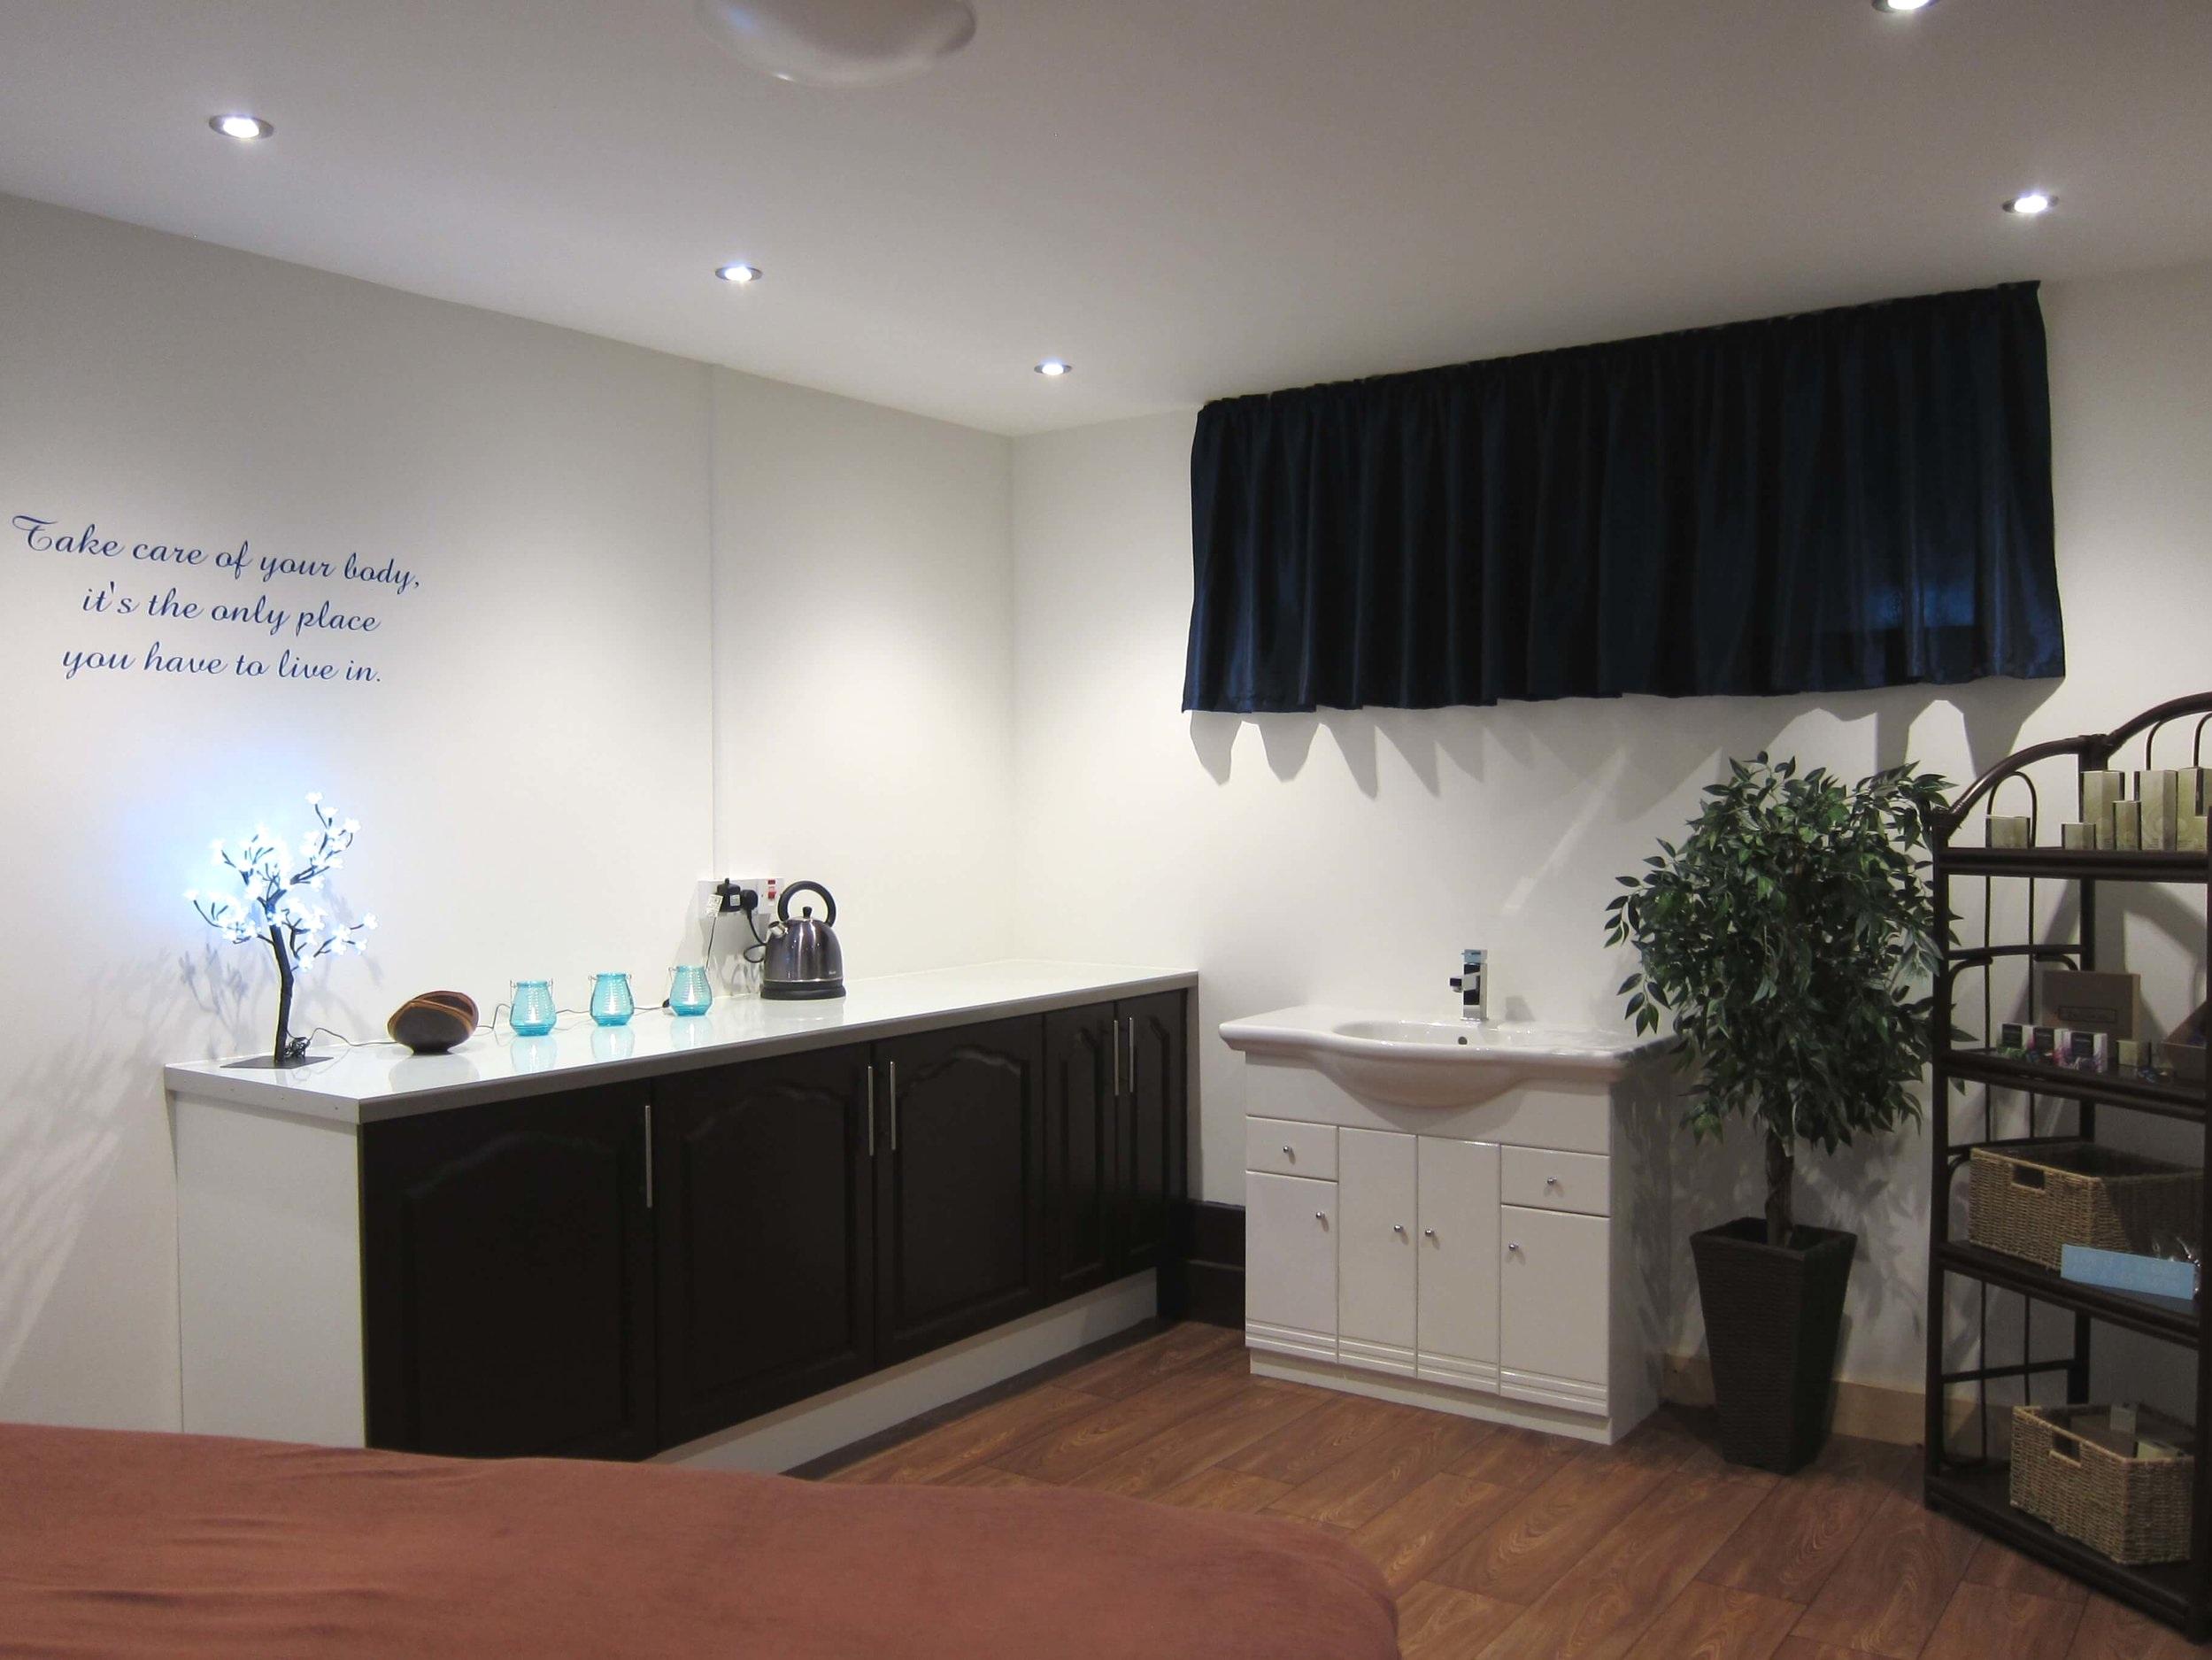 Our Pamper Room -